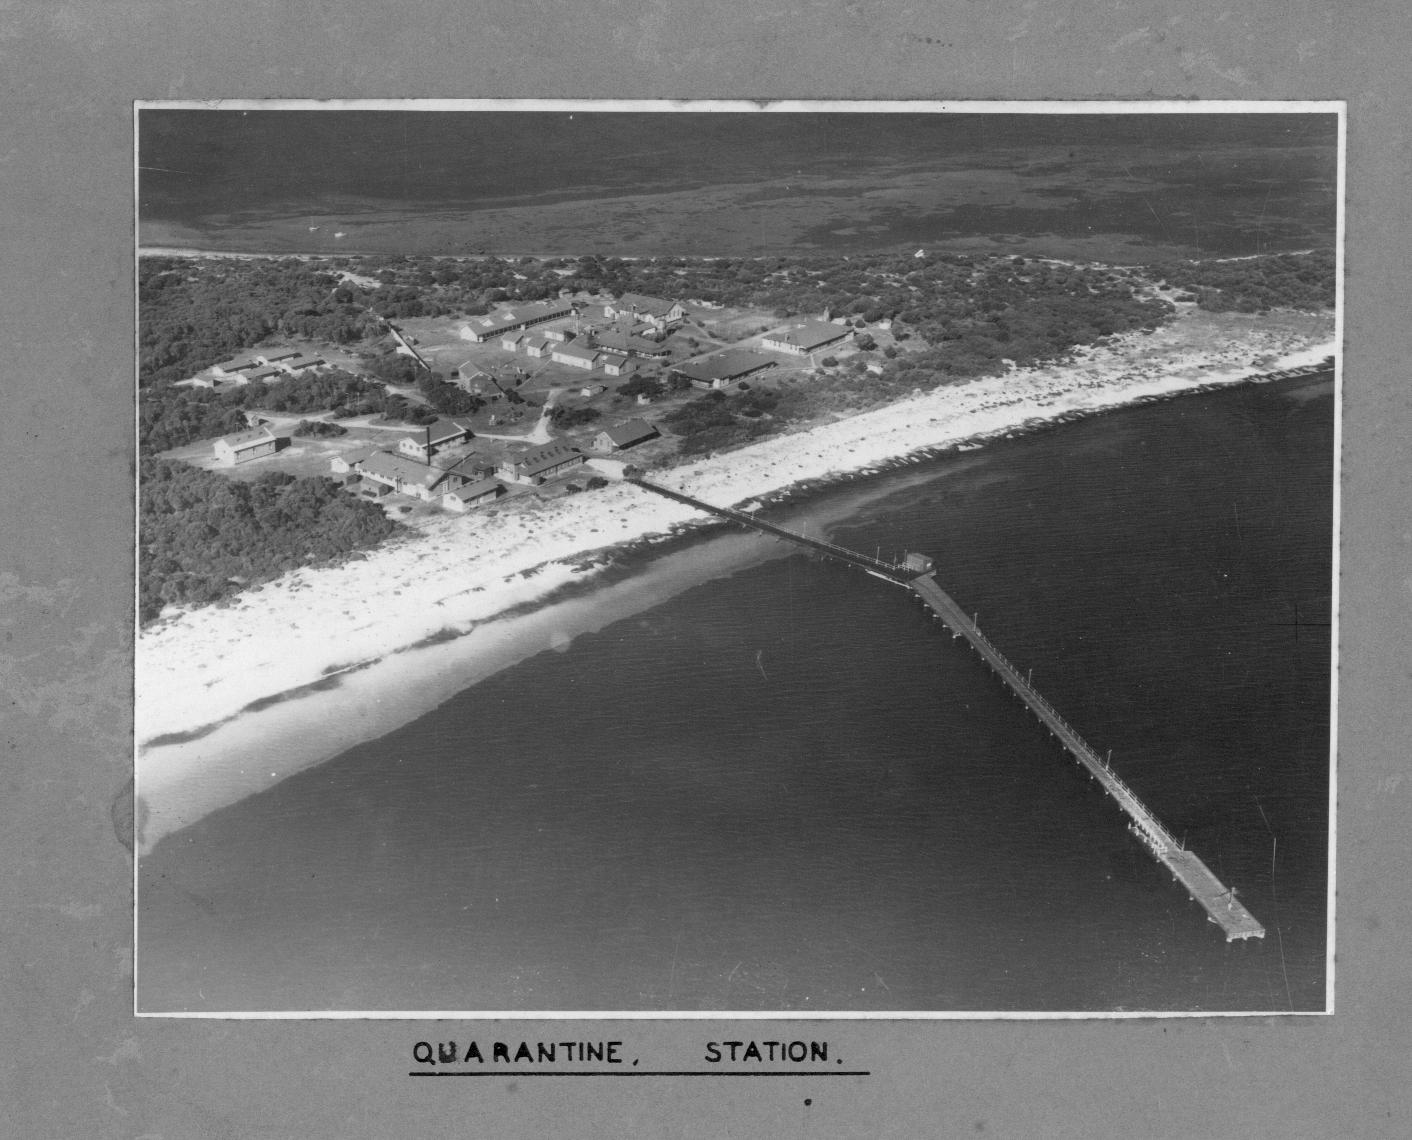 Quarantine Station aerial view2